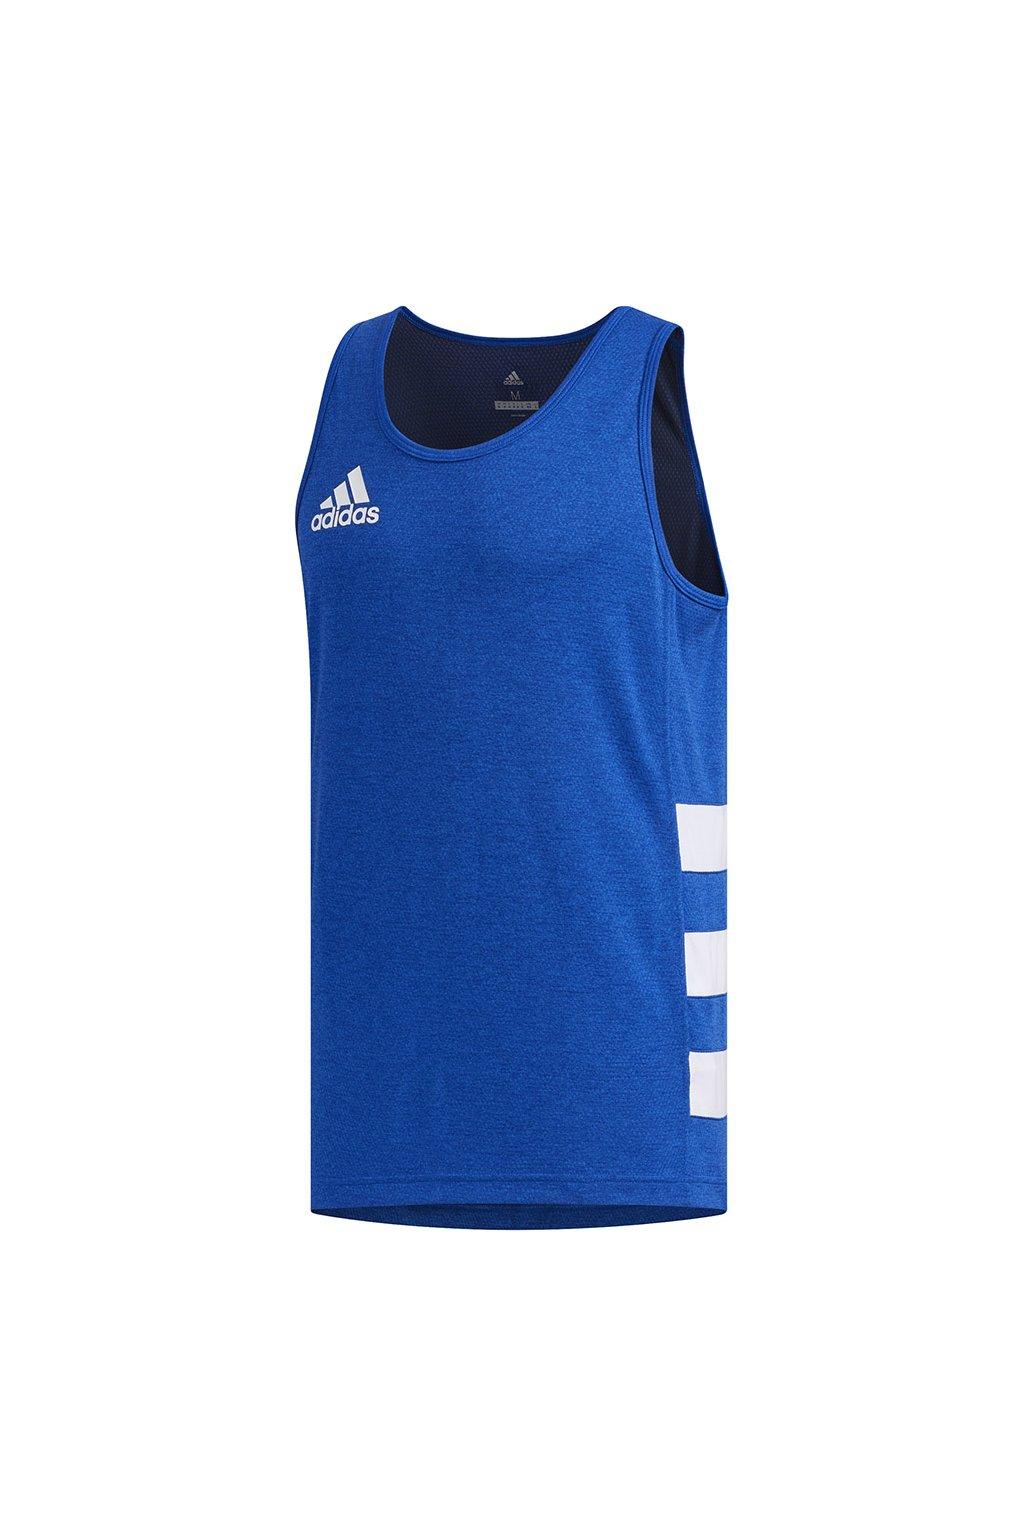 Pánske tričko adidas Rugby Singlet modrá FM4137